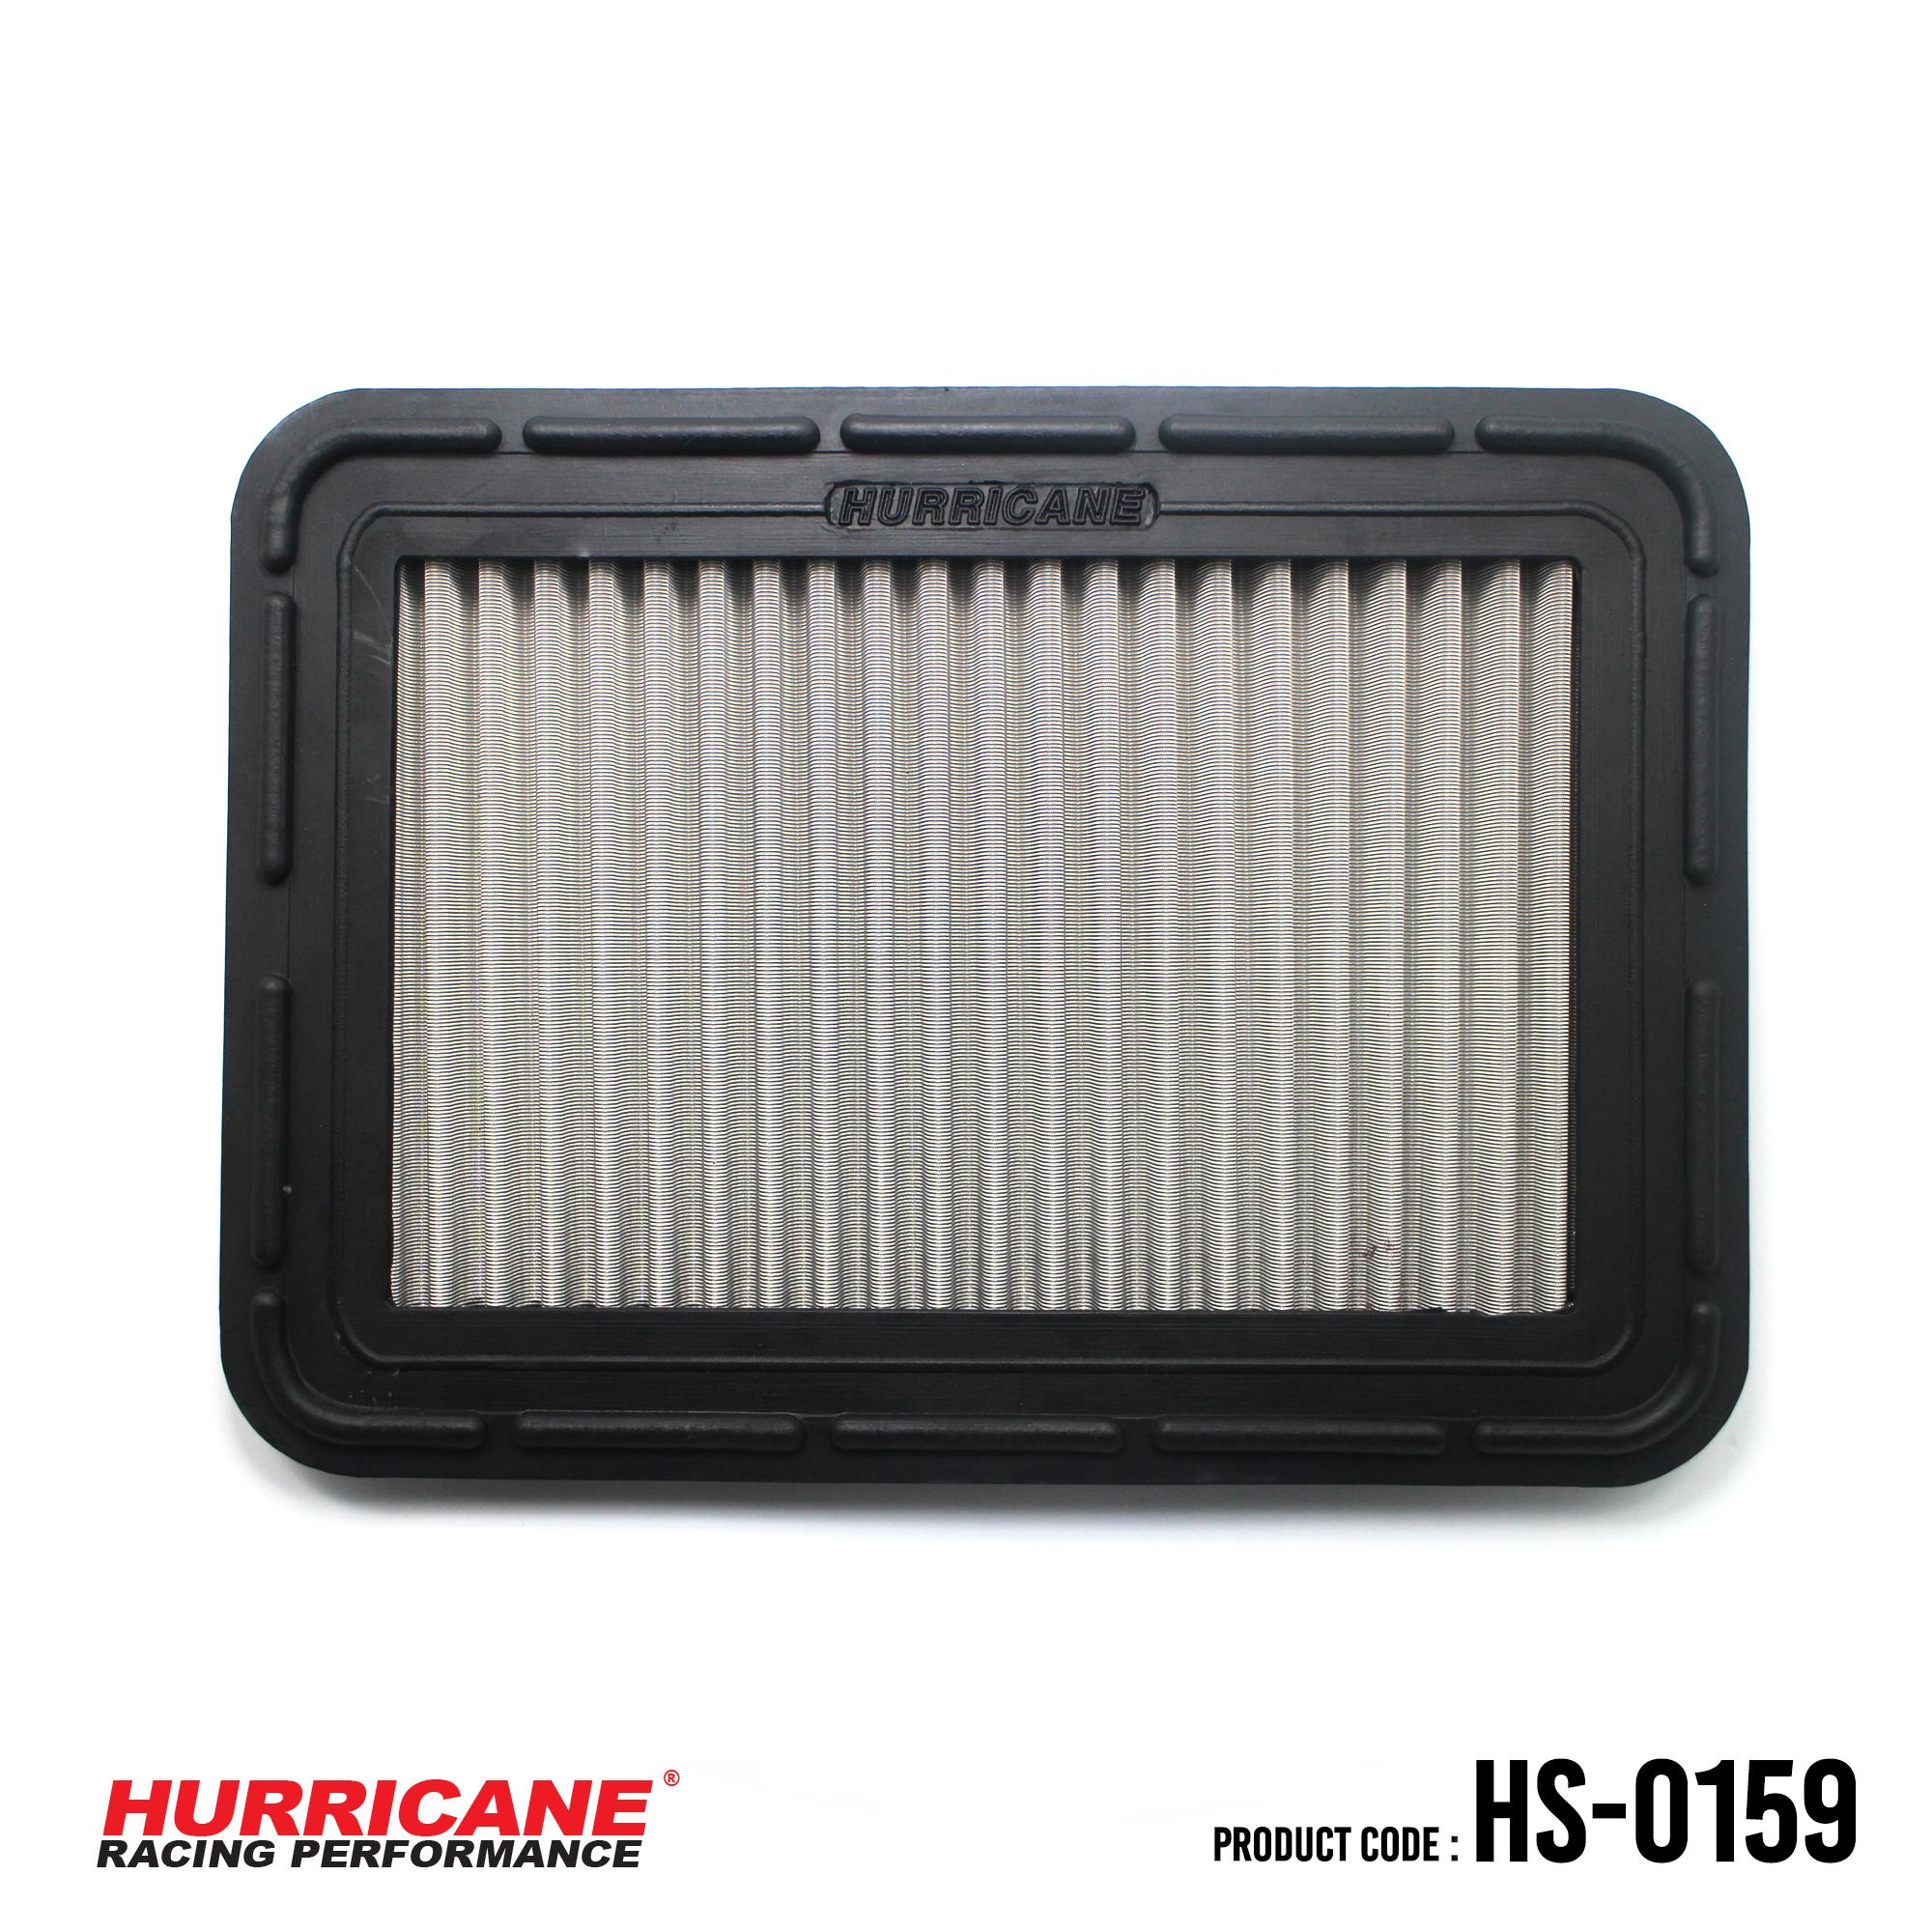 HURRICANE STAINLESS STEEL AIR FILTER FOR HS-0159 Daihatsu